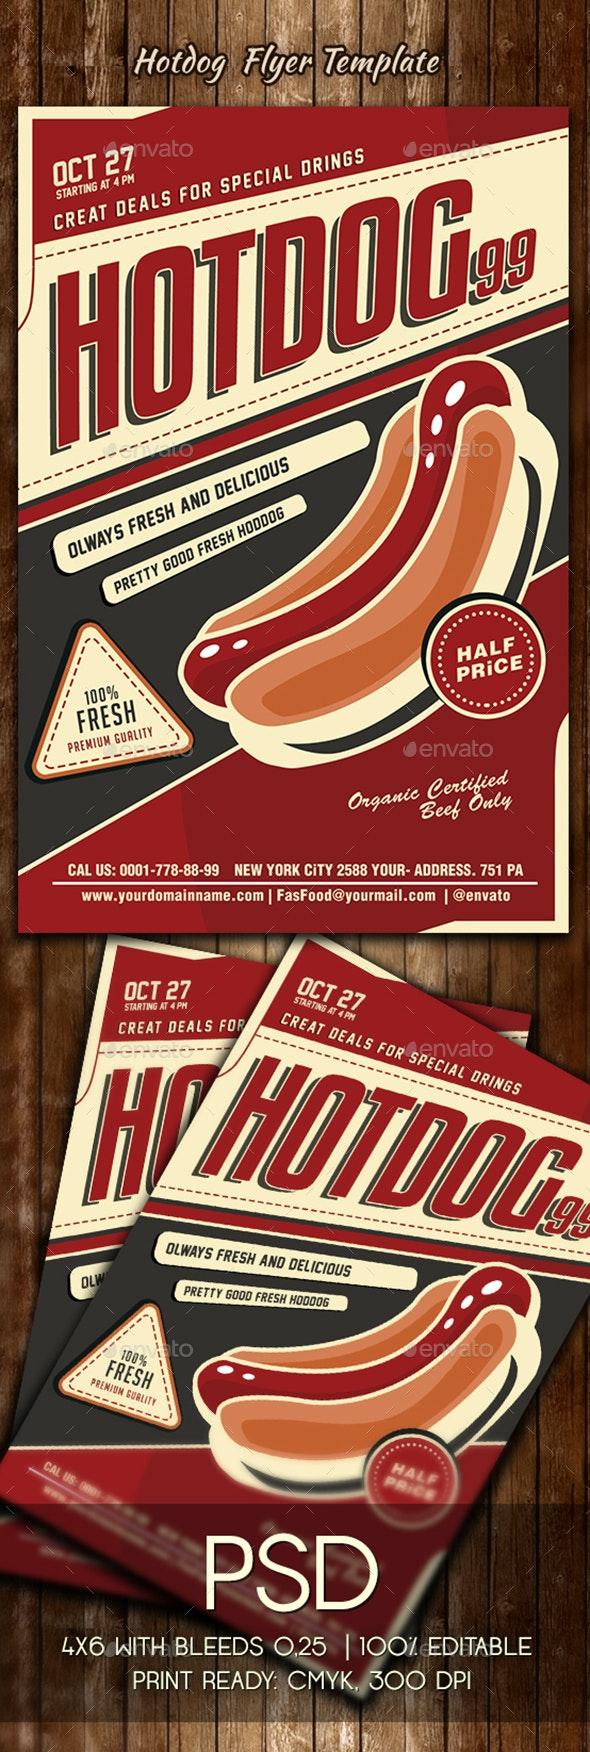 Hotdog Flyer Template - Restaurant Flyers